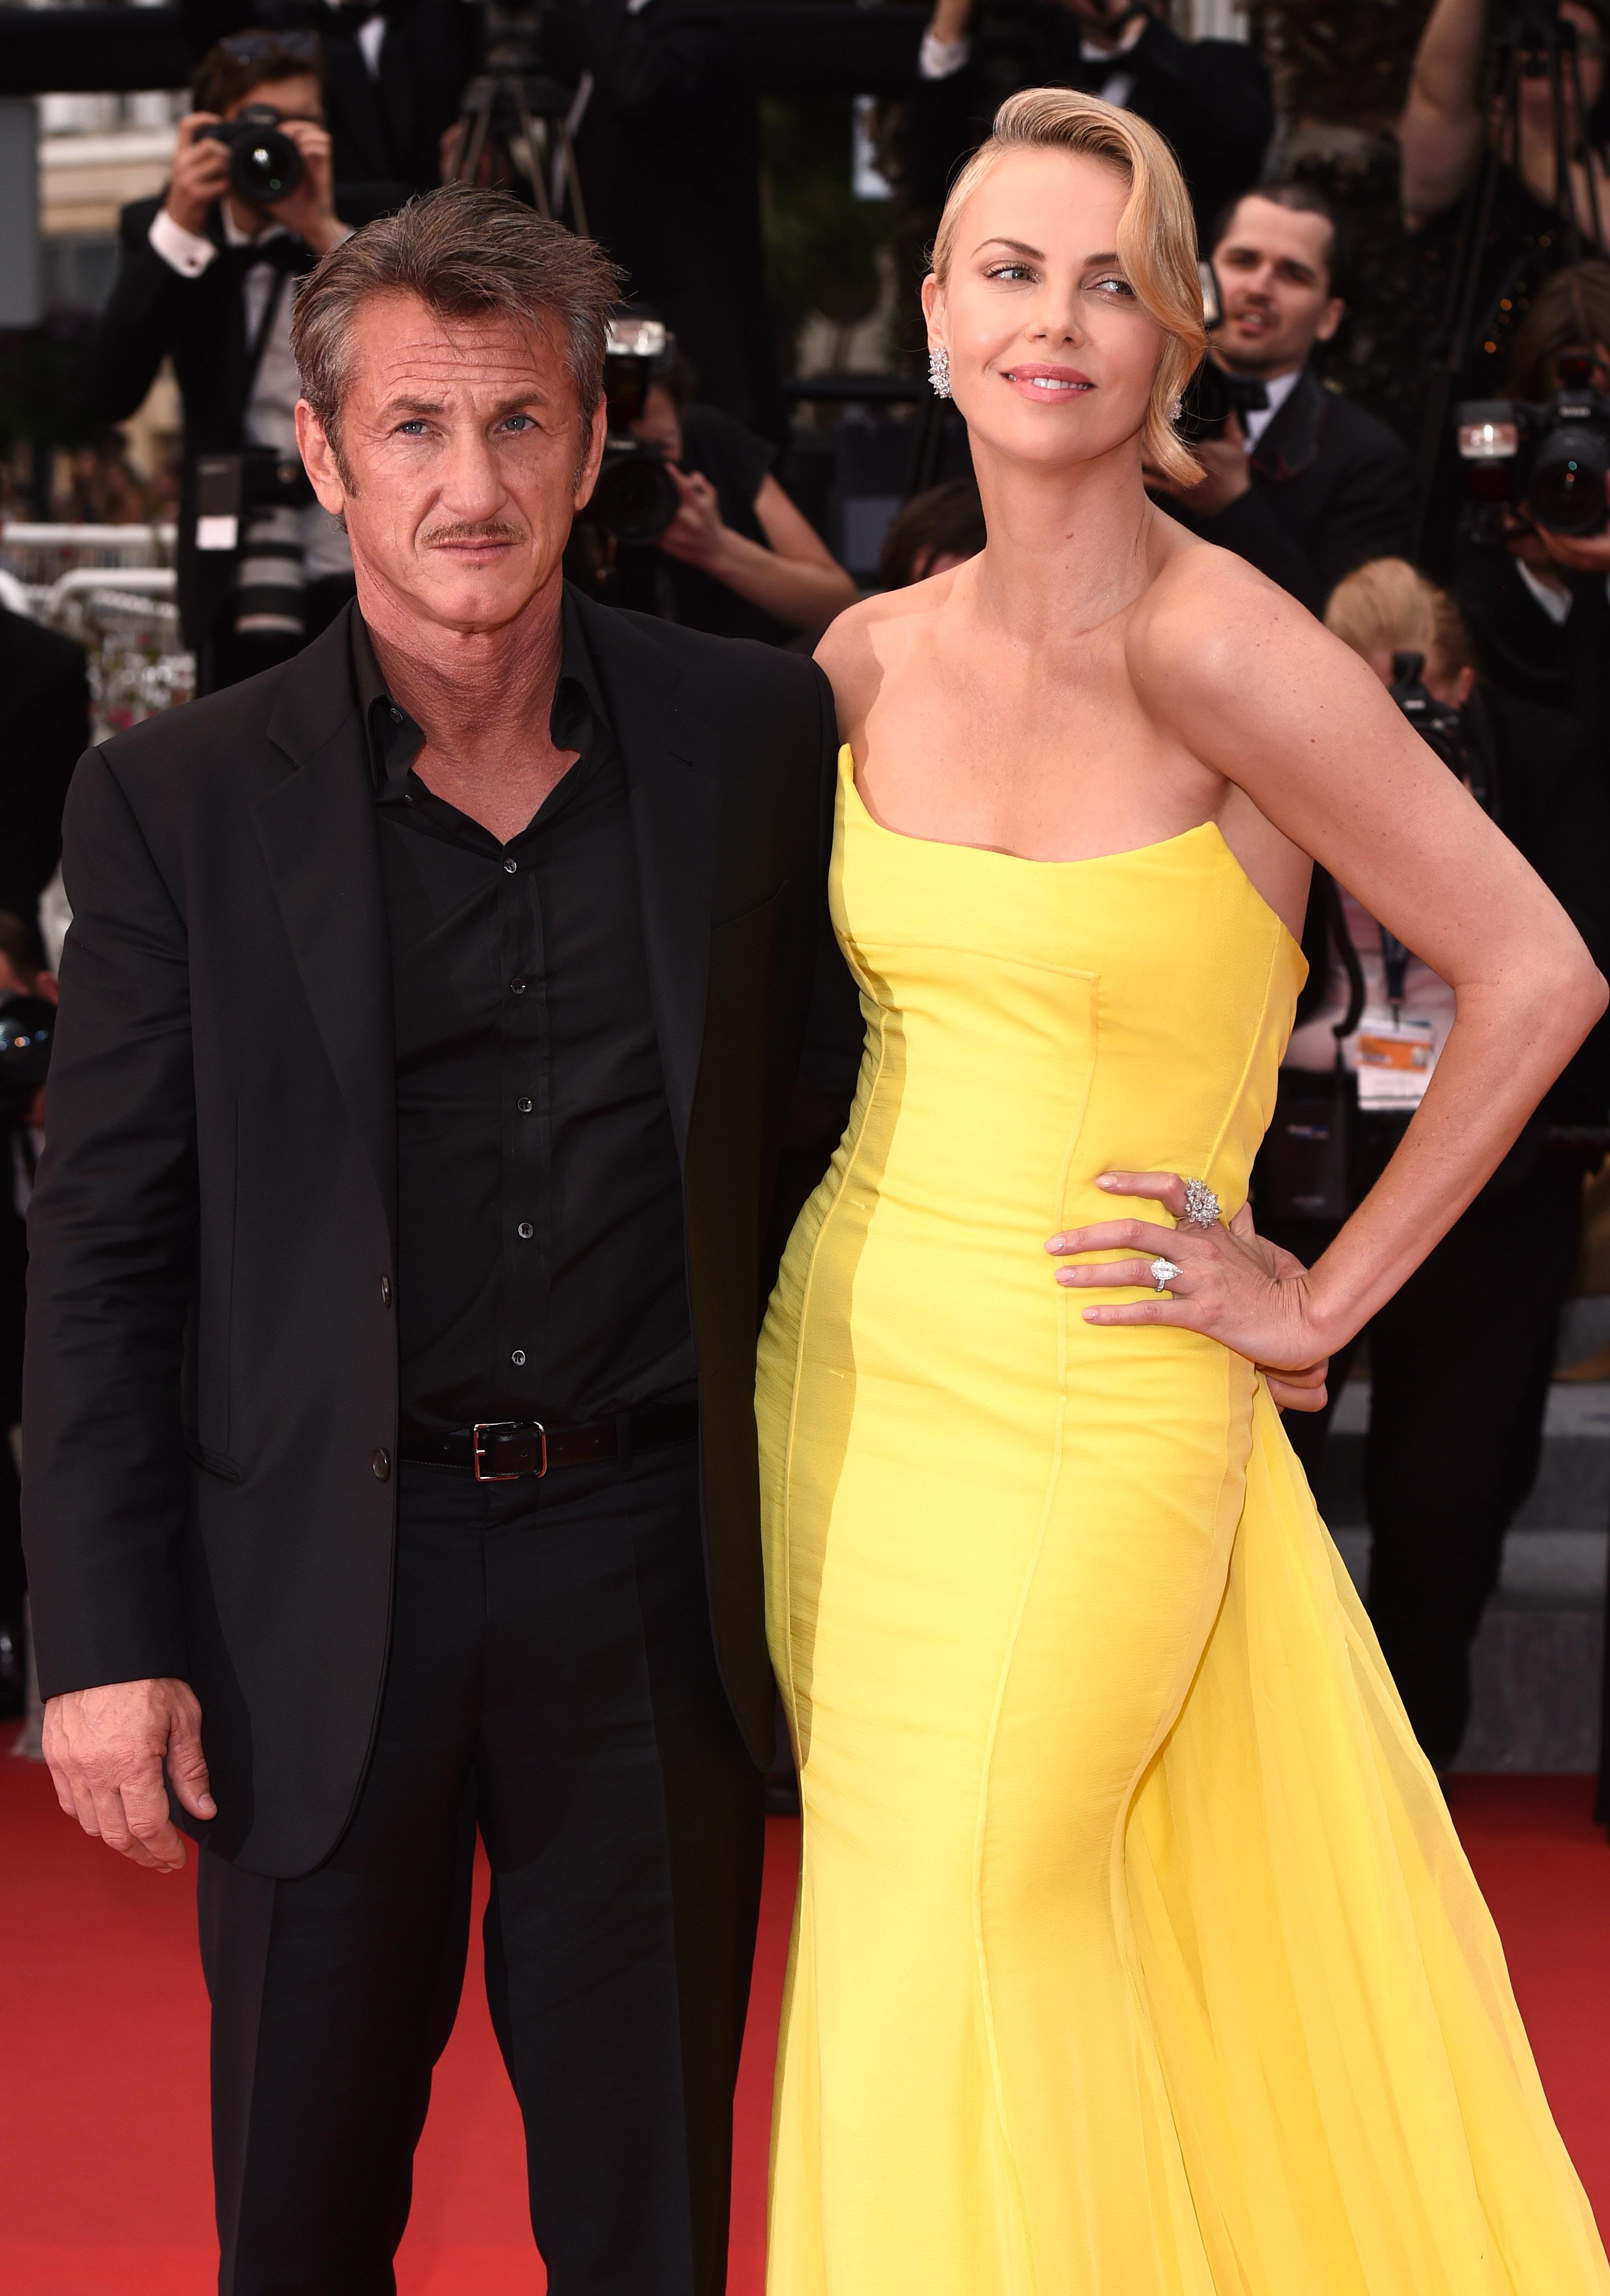 Charlize Theron, ex boyfriend Sean Penn, Cannes